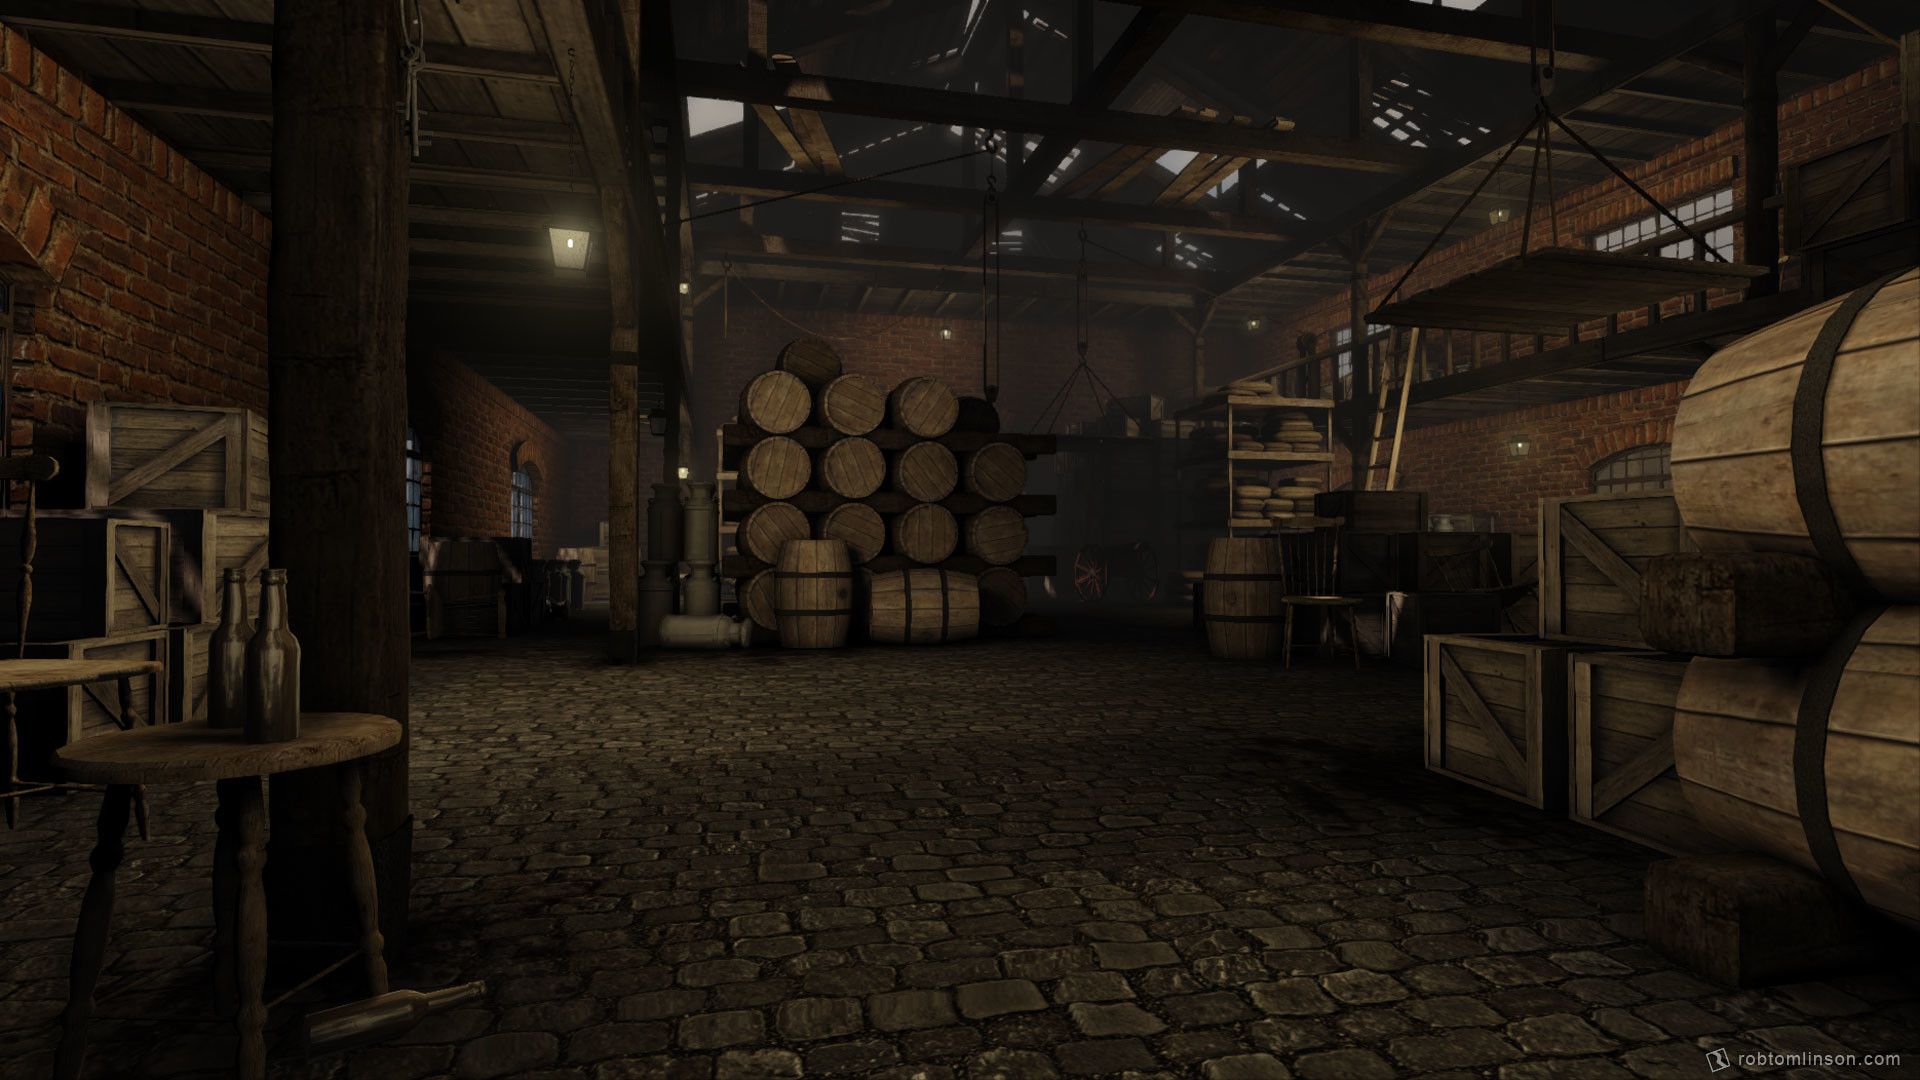 Rob tomlinson warehouse 1